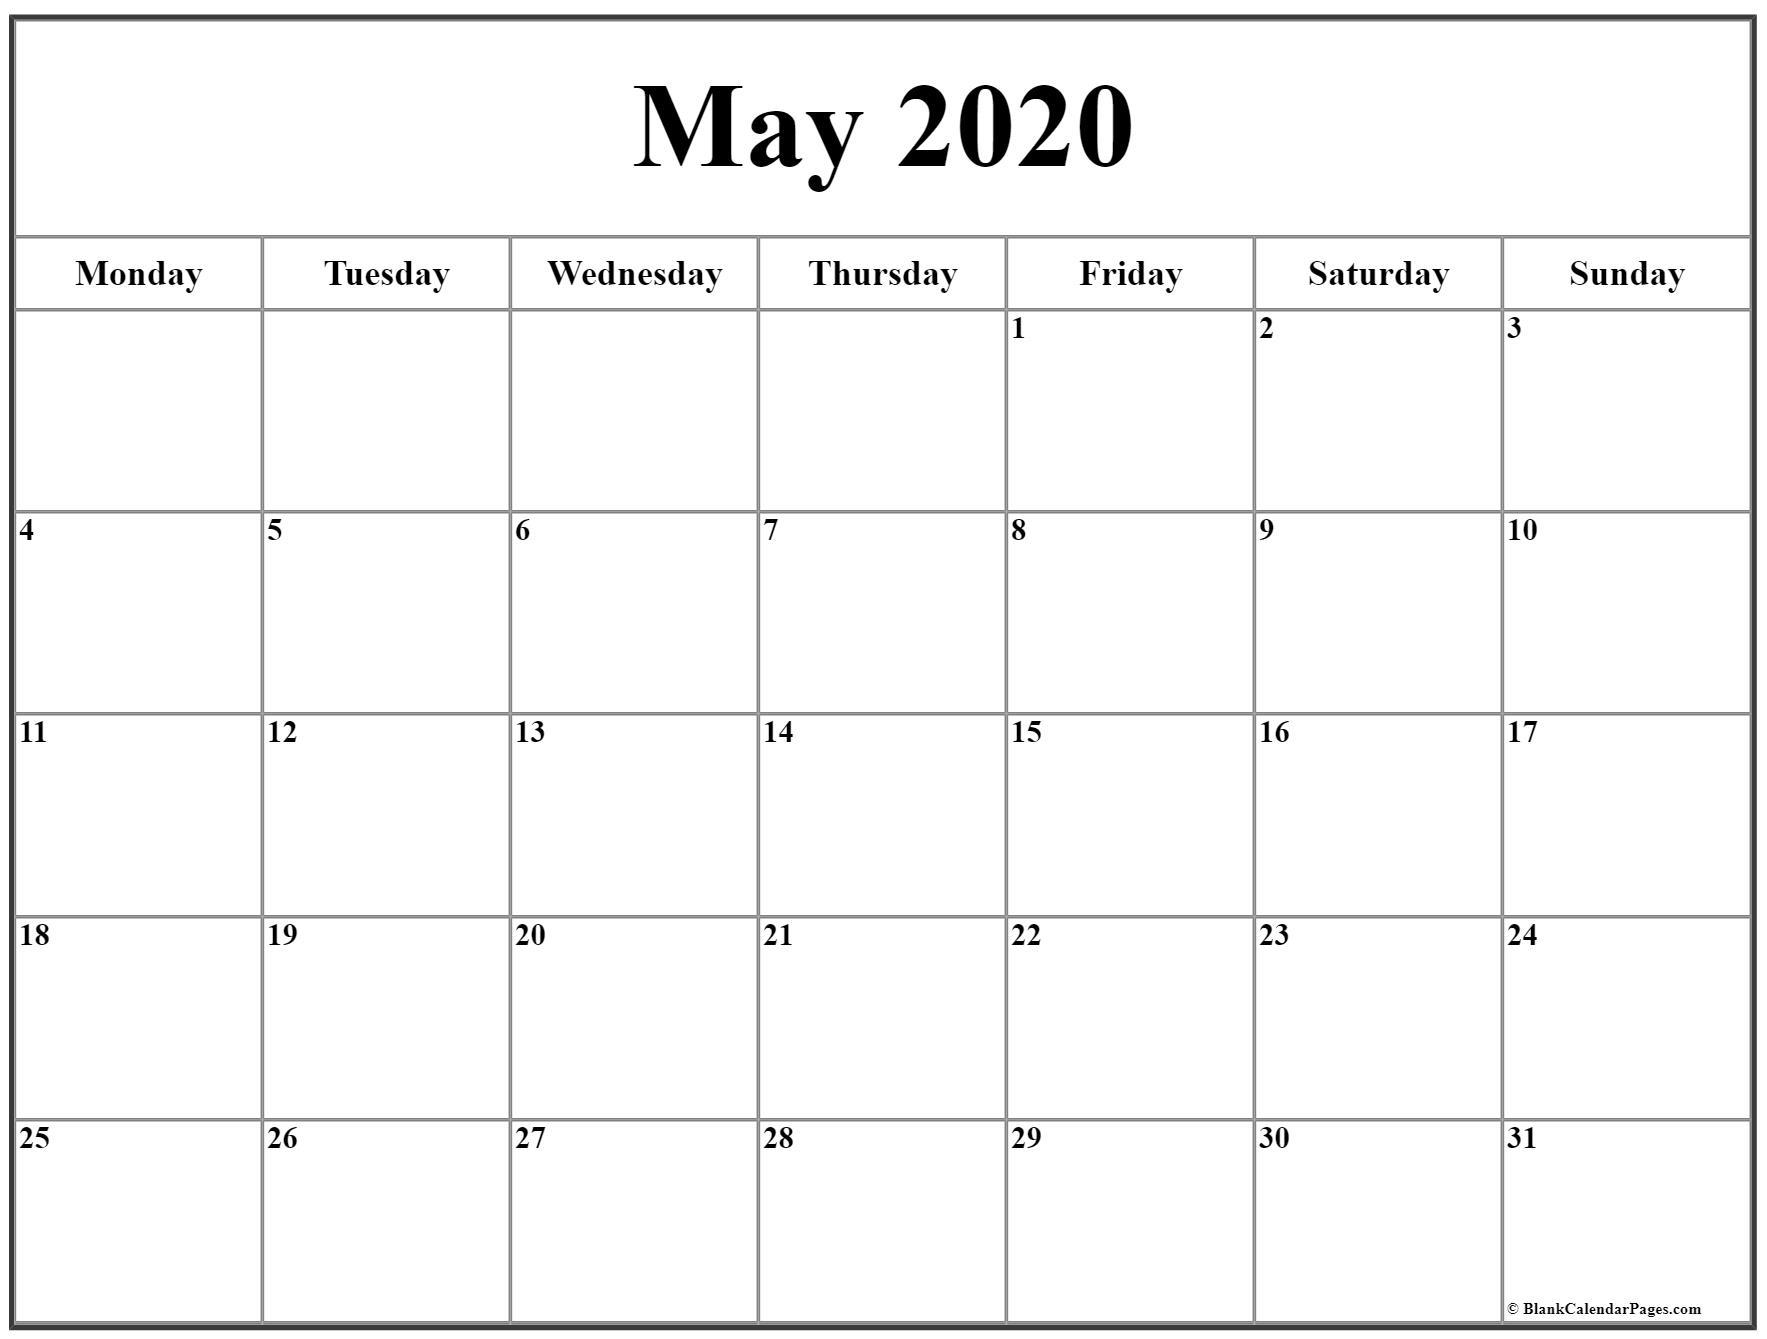 May 2020 Monday Calendar | Monday To Sunday regarding 2020 Calendar Starts On Monday